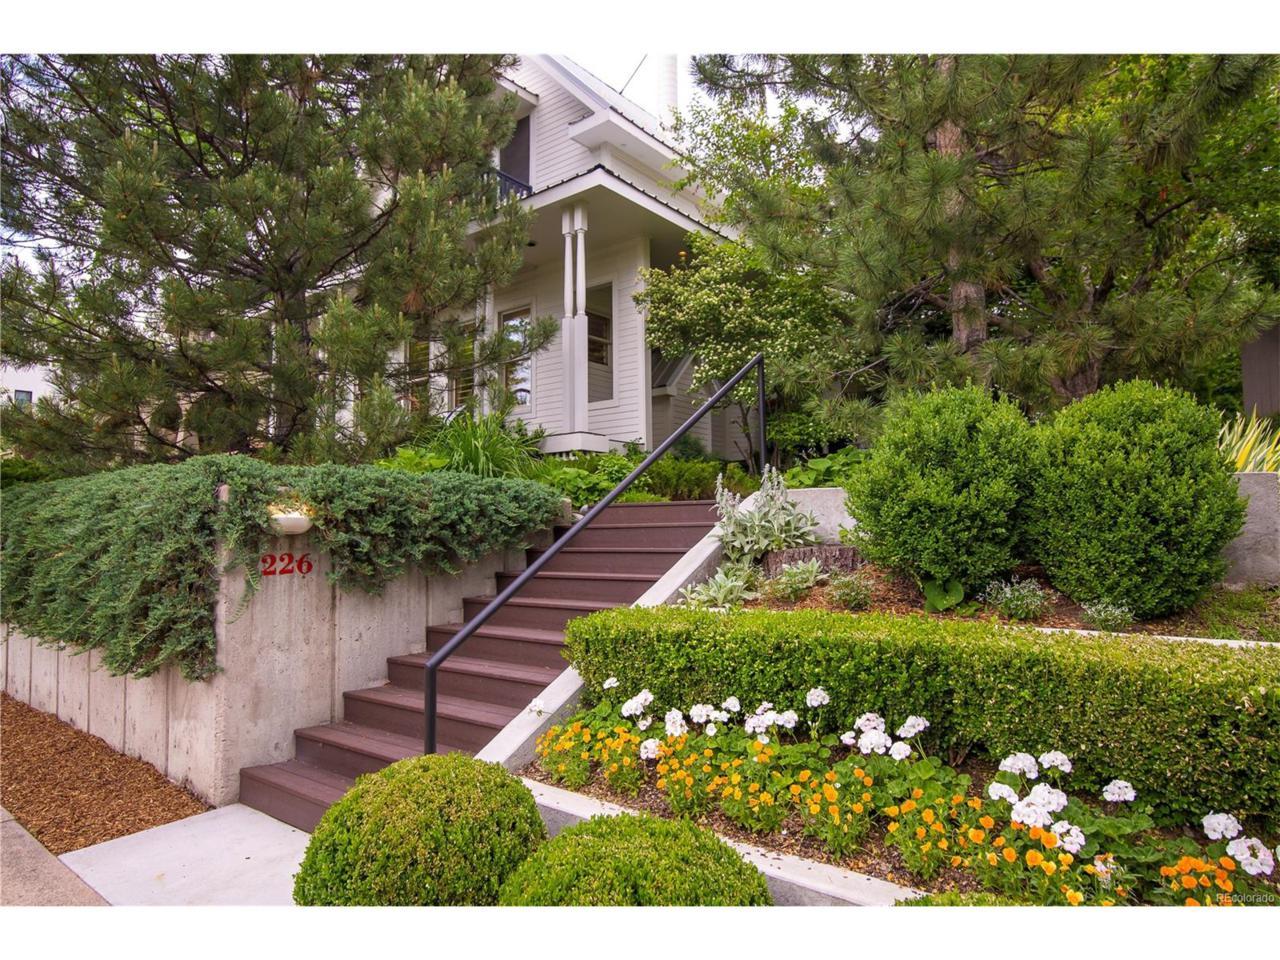 226 S Franklin Street, Denver, CO 80209 (MLS #9655205) :: 8z Real Estate